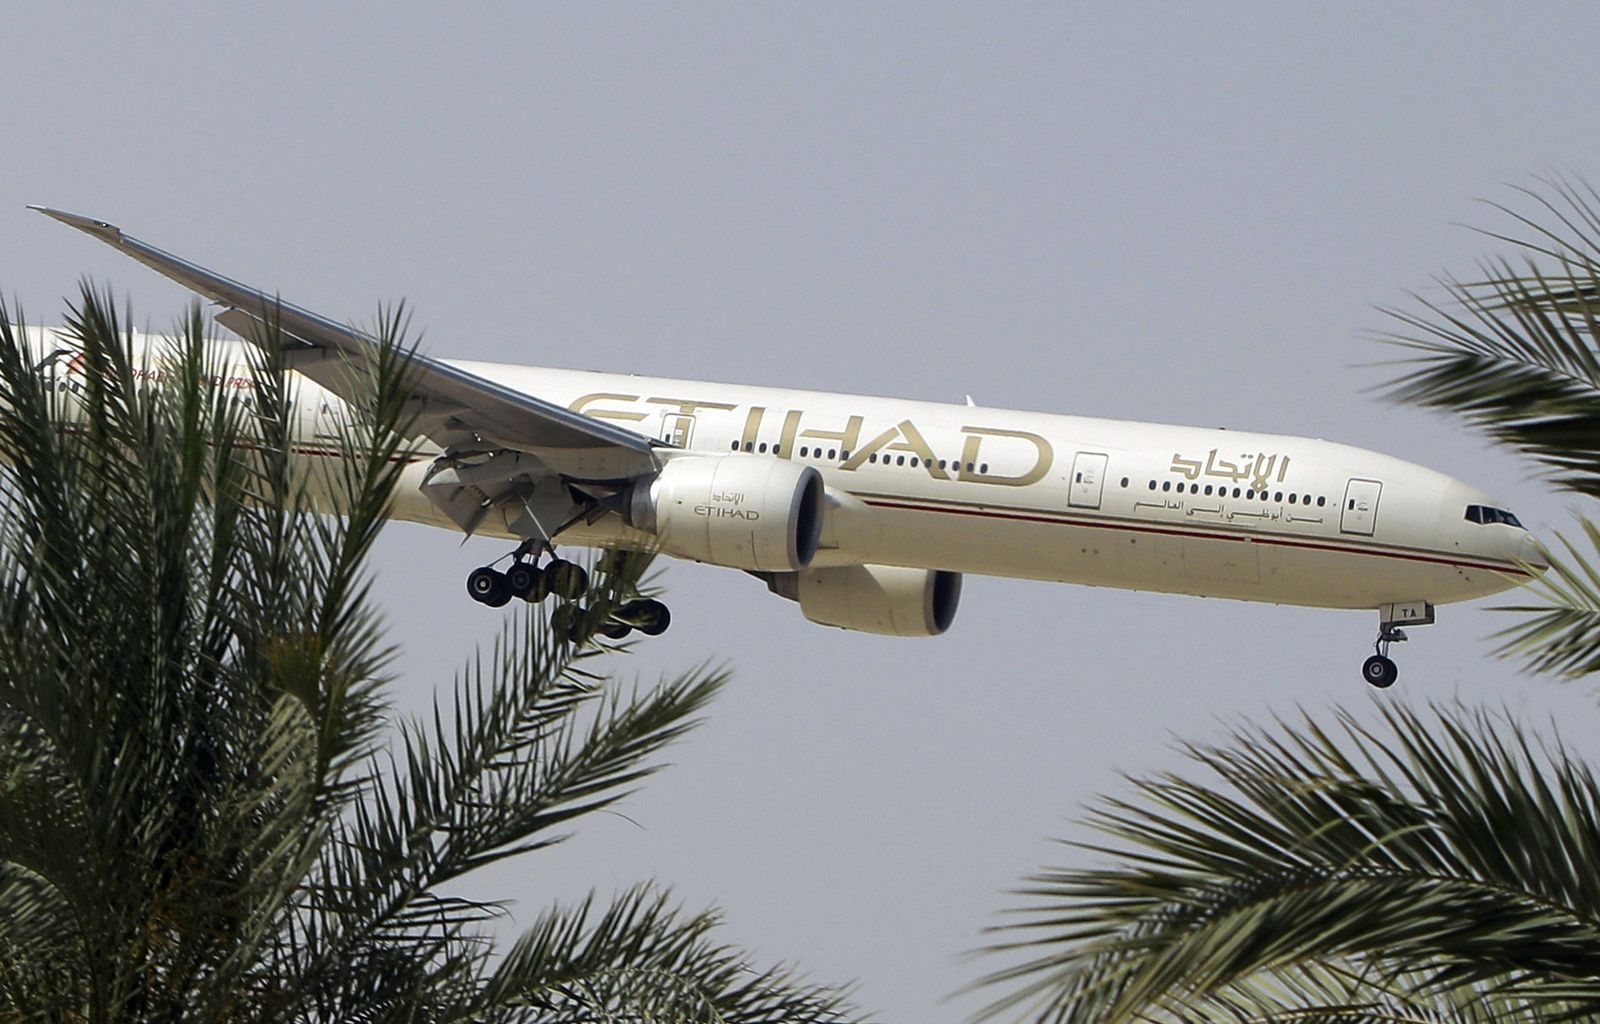 Mideast Emirates Indonesia Turbulence